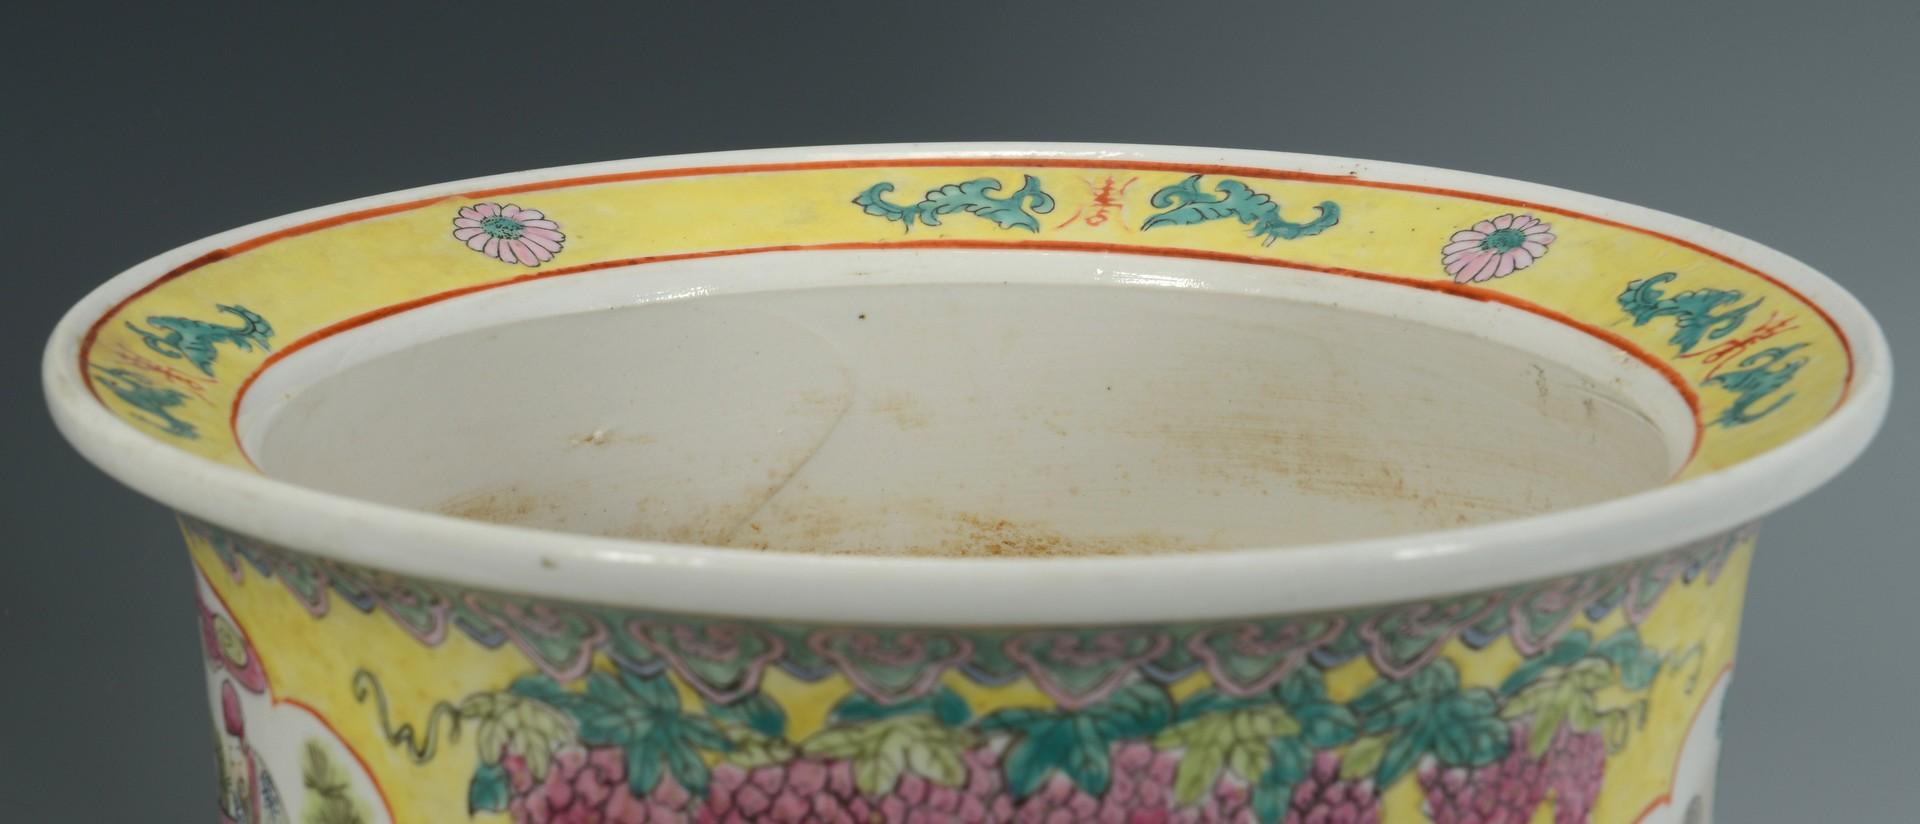 Lot 3383238: Chinese Ceramic Floor Vase and Planter